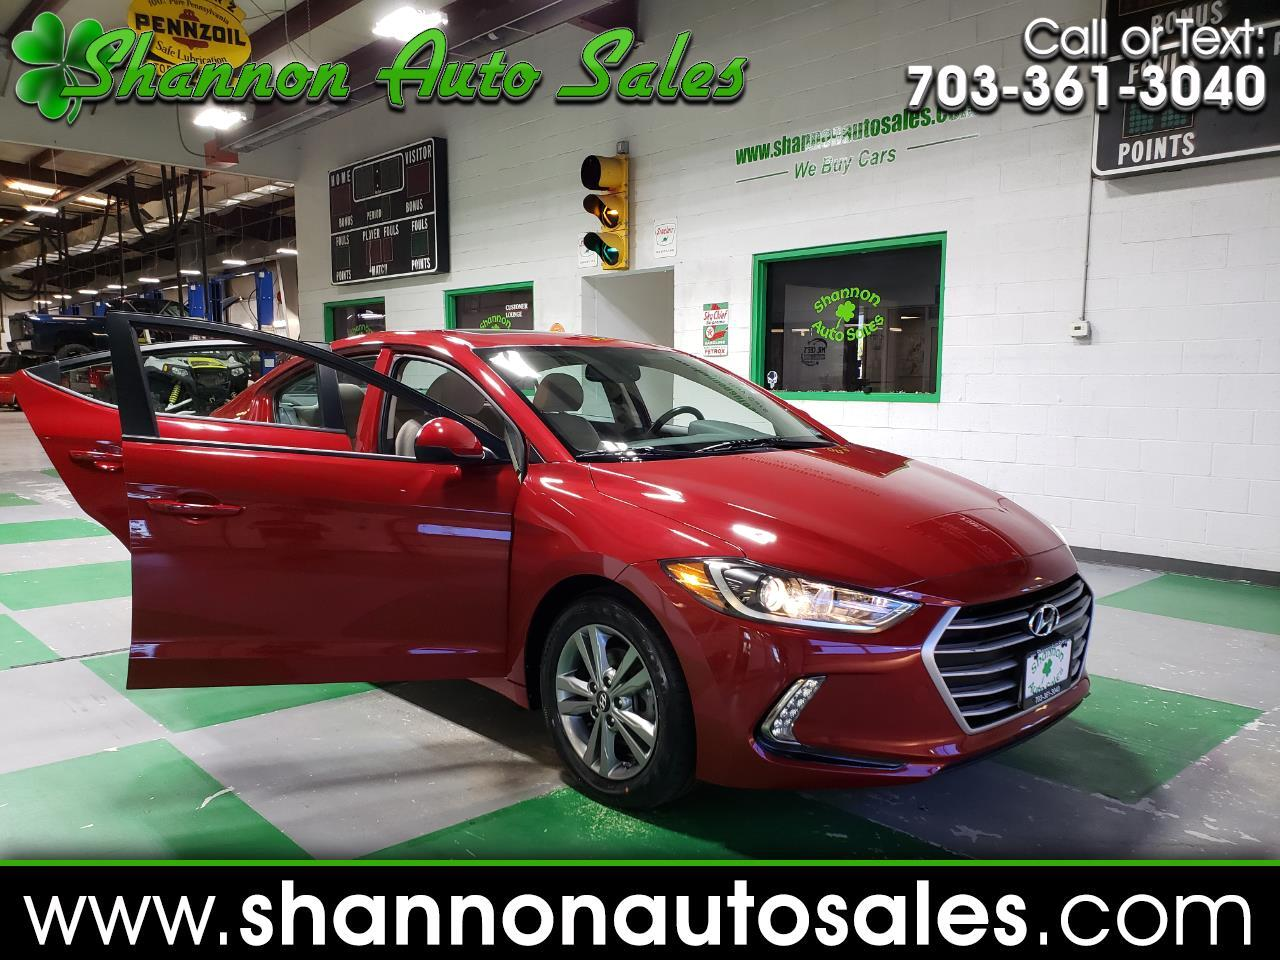 2017 Hyundai Elantra 4dr Sdn Auto Value Edition (Alabama Plant)